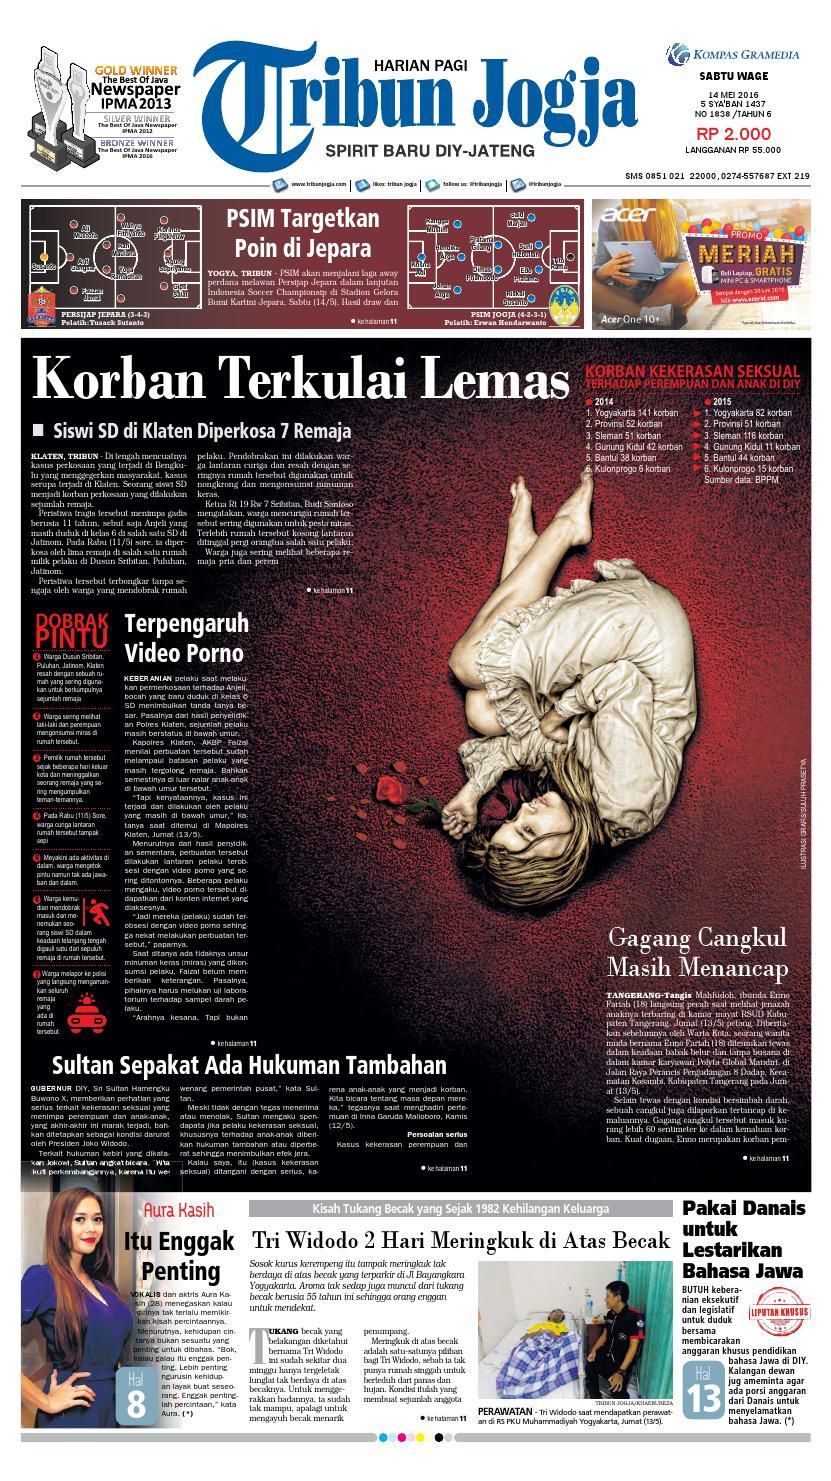 Tribunjogja 14 05 2016 By Tribun Jogja Issuu Produk Ukm Bumn Jamu Kunyit Asam Seger Waras